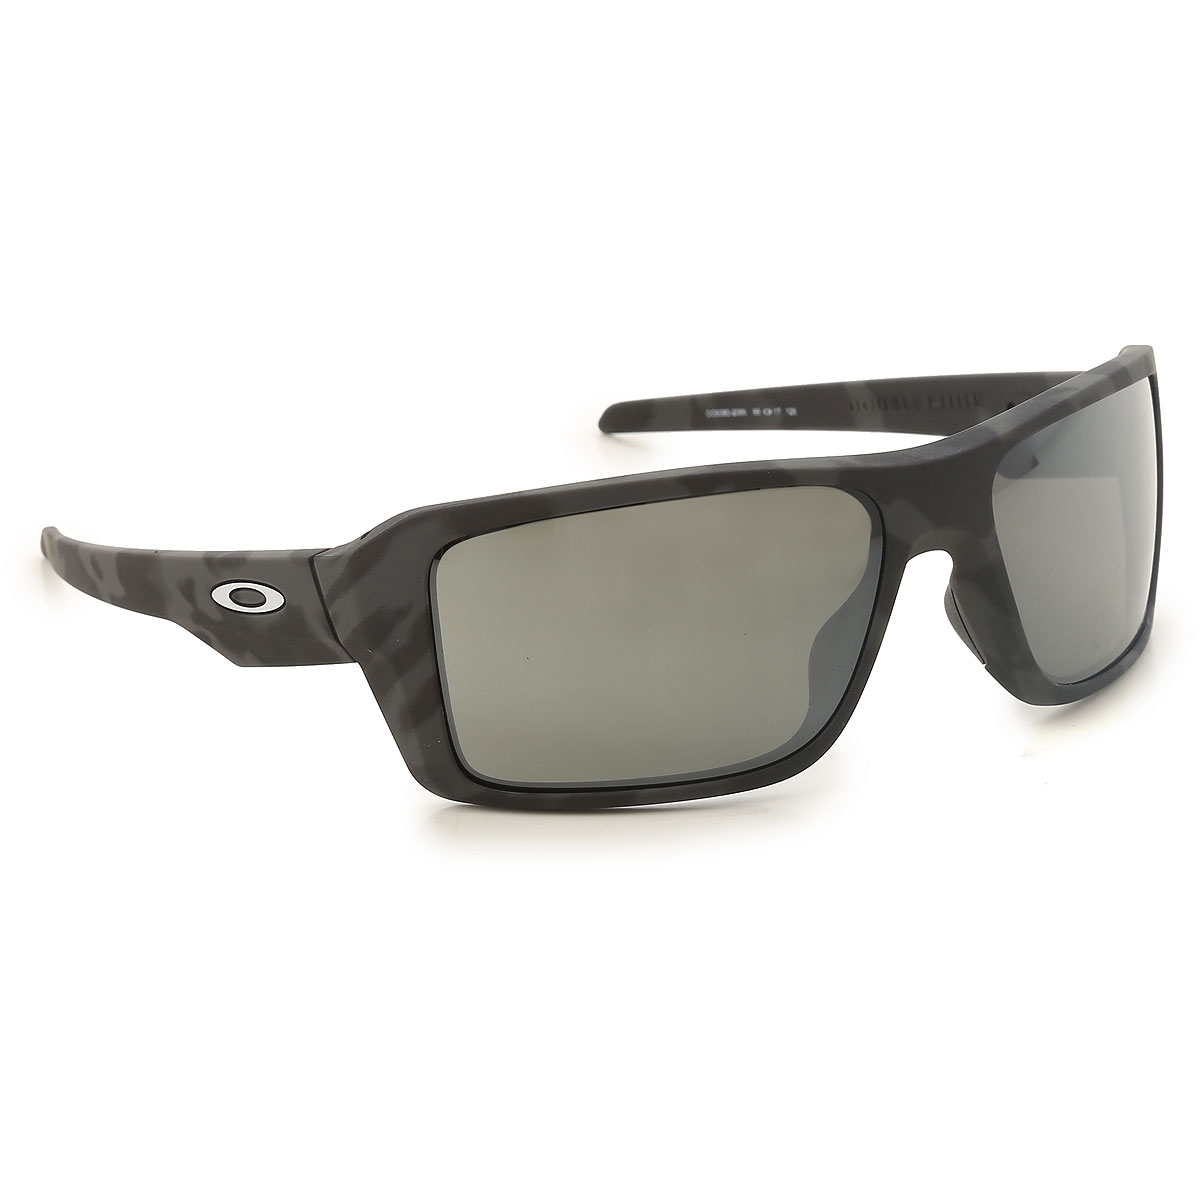 Oakley Sunglasses On Sale, Black Camouflage, 2019